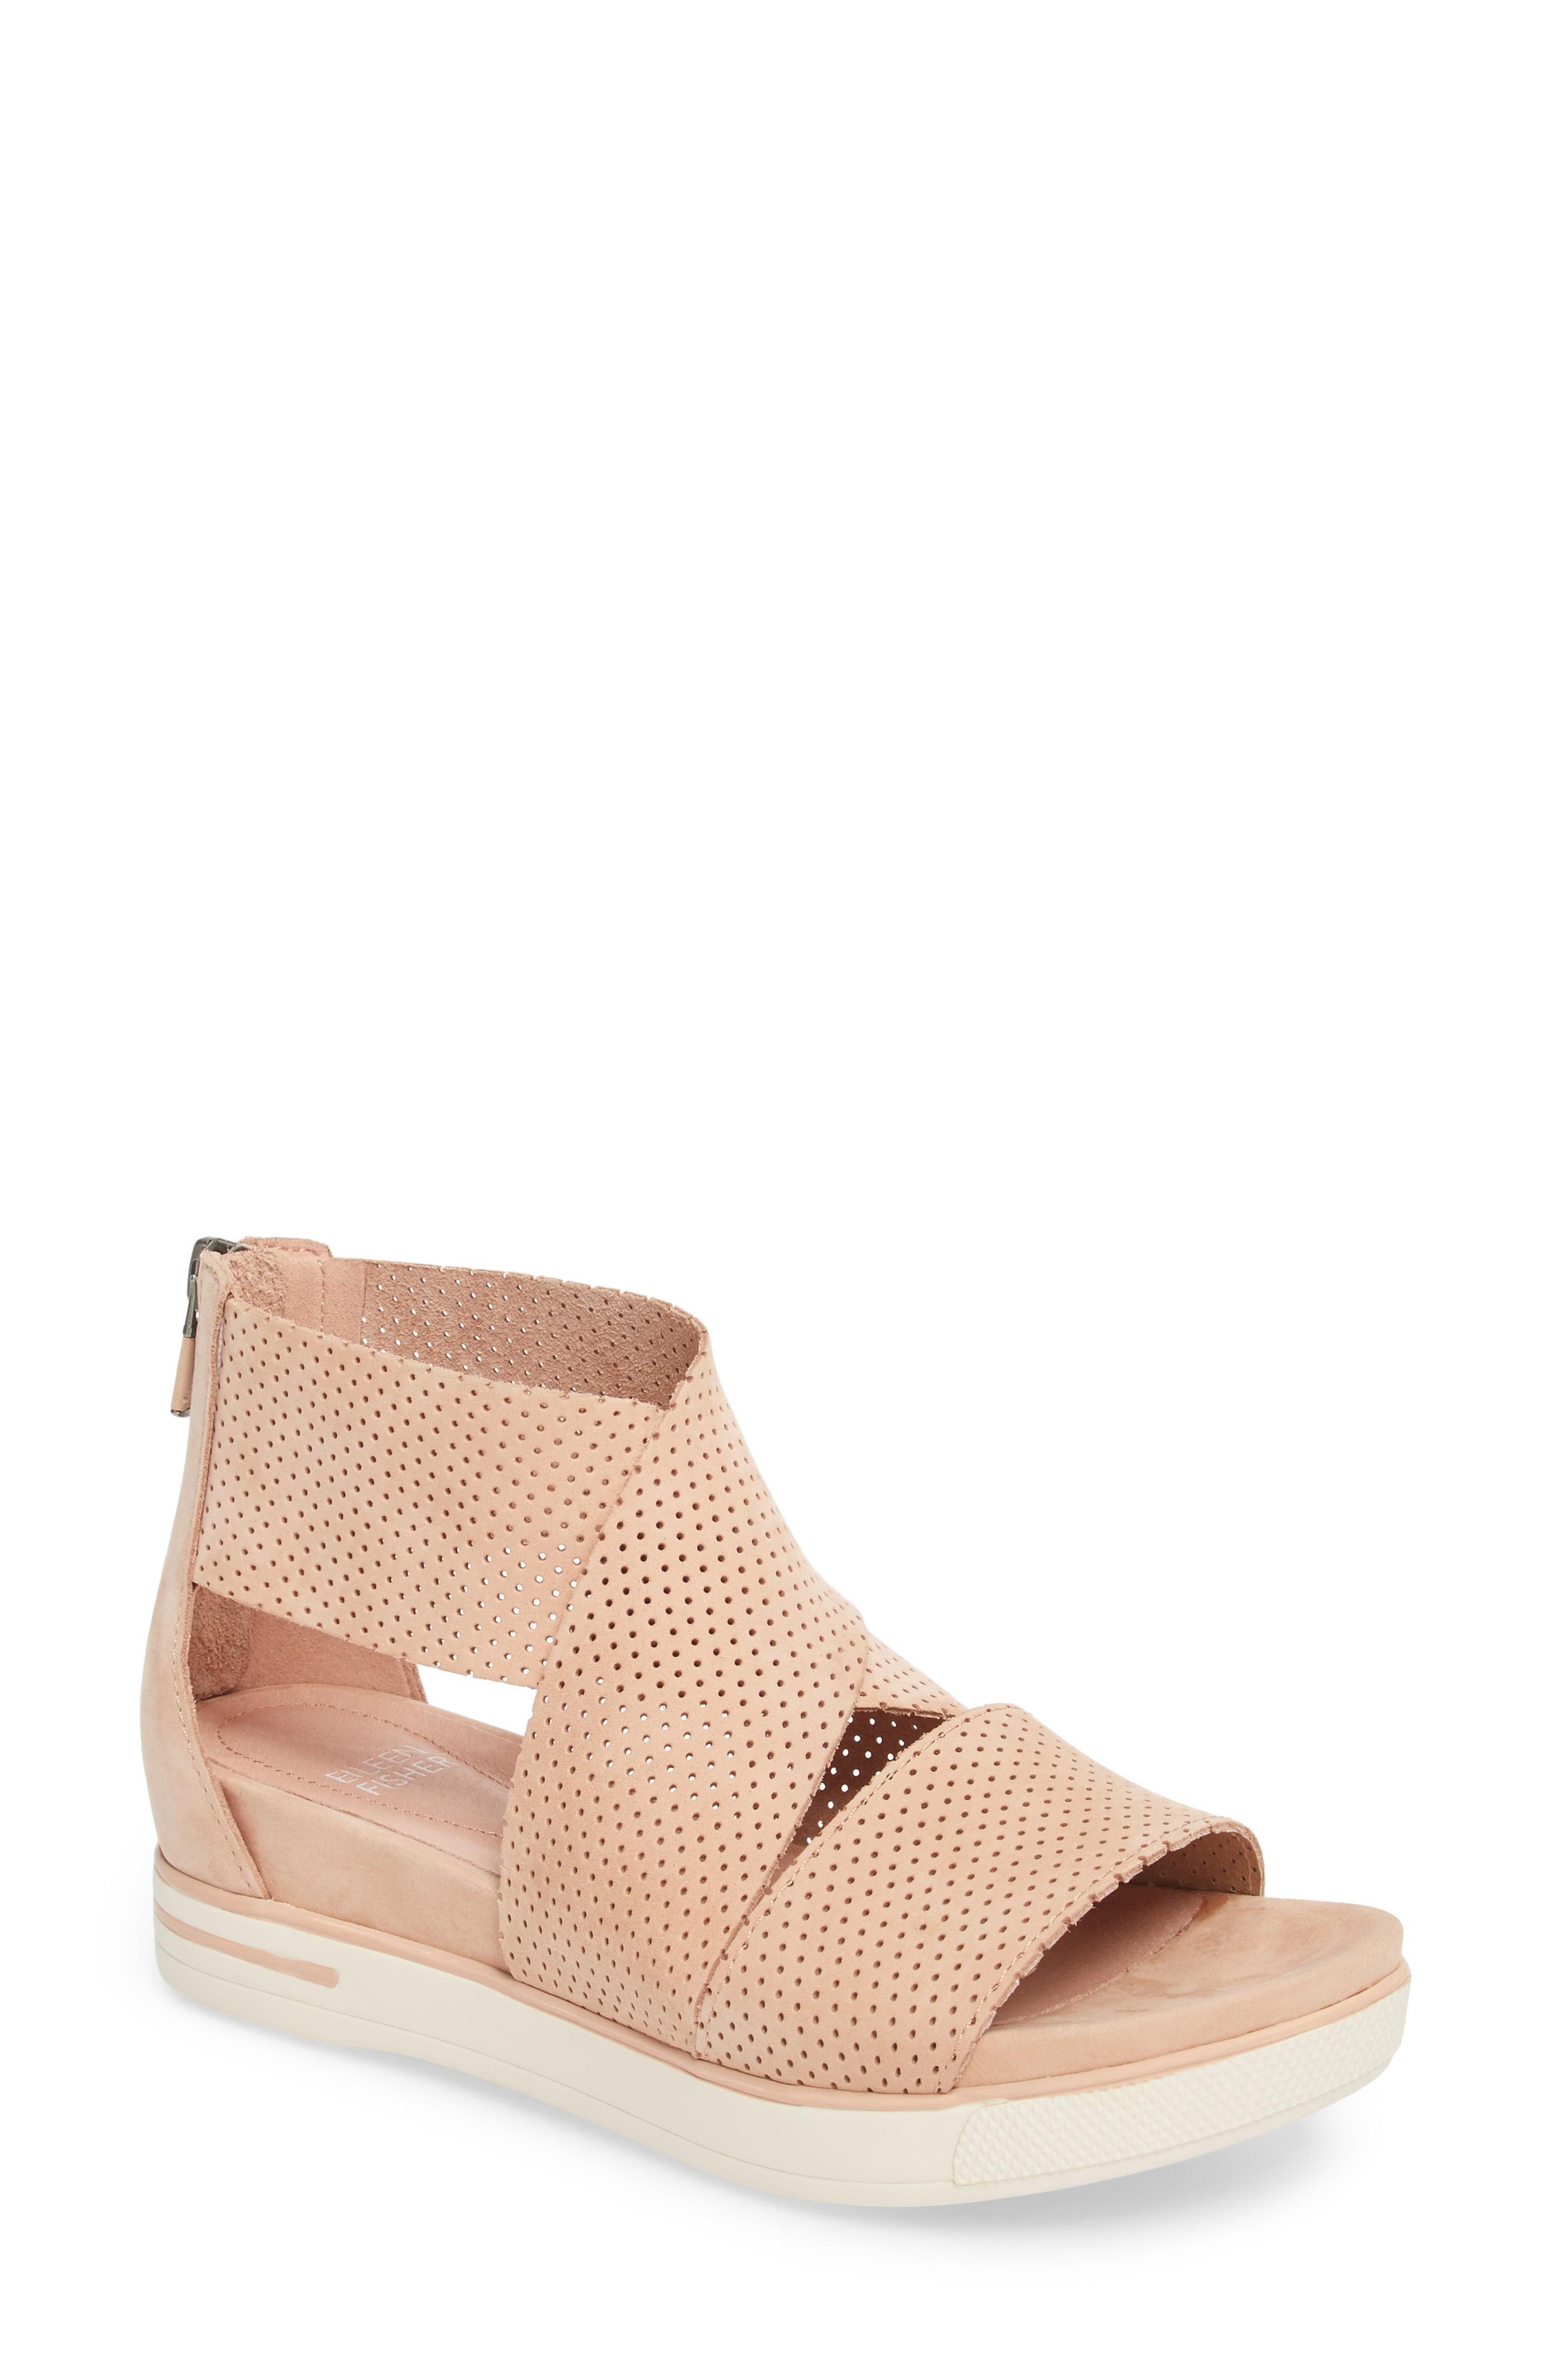 bb55b9668e6 Lyst - Eileen Fisher Sport Platform Sandal in Red - Save 67%